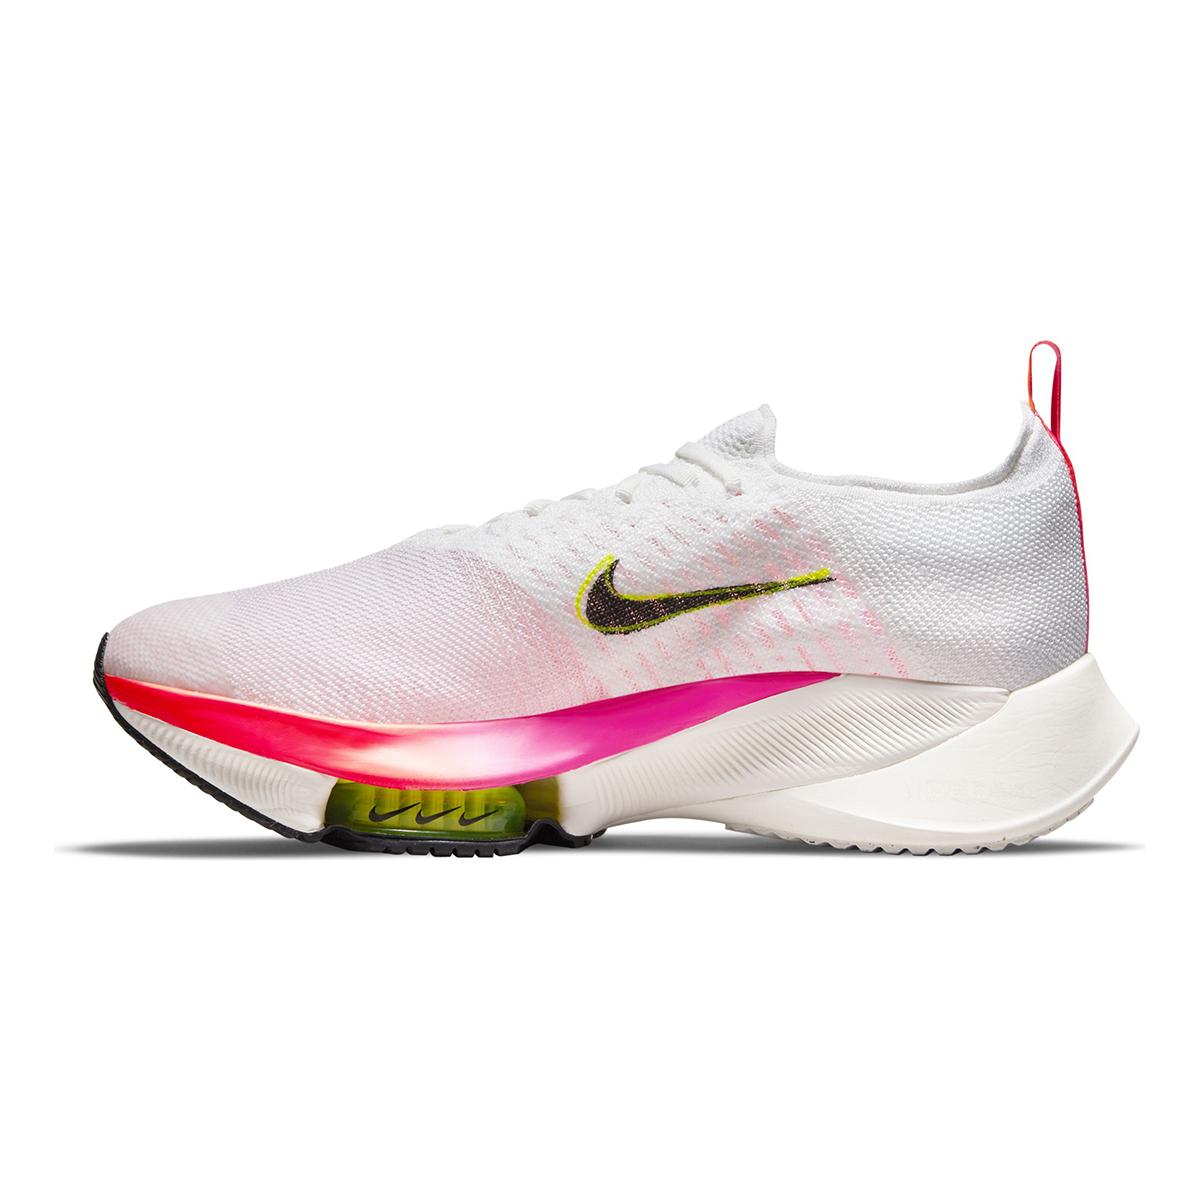 Men's Nike Air Zoom Tempo Next% Flyknit Running Shoe - Color: Rawdacious - Size: 6 - Width: Regular, Rawdacious, large, image 2